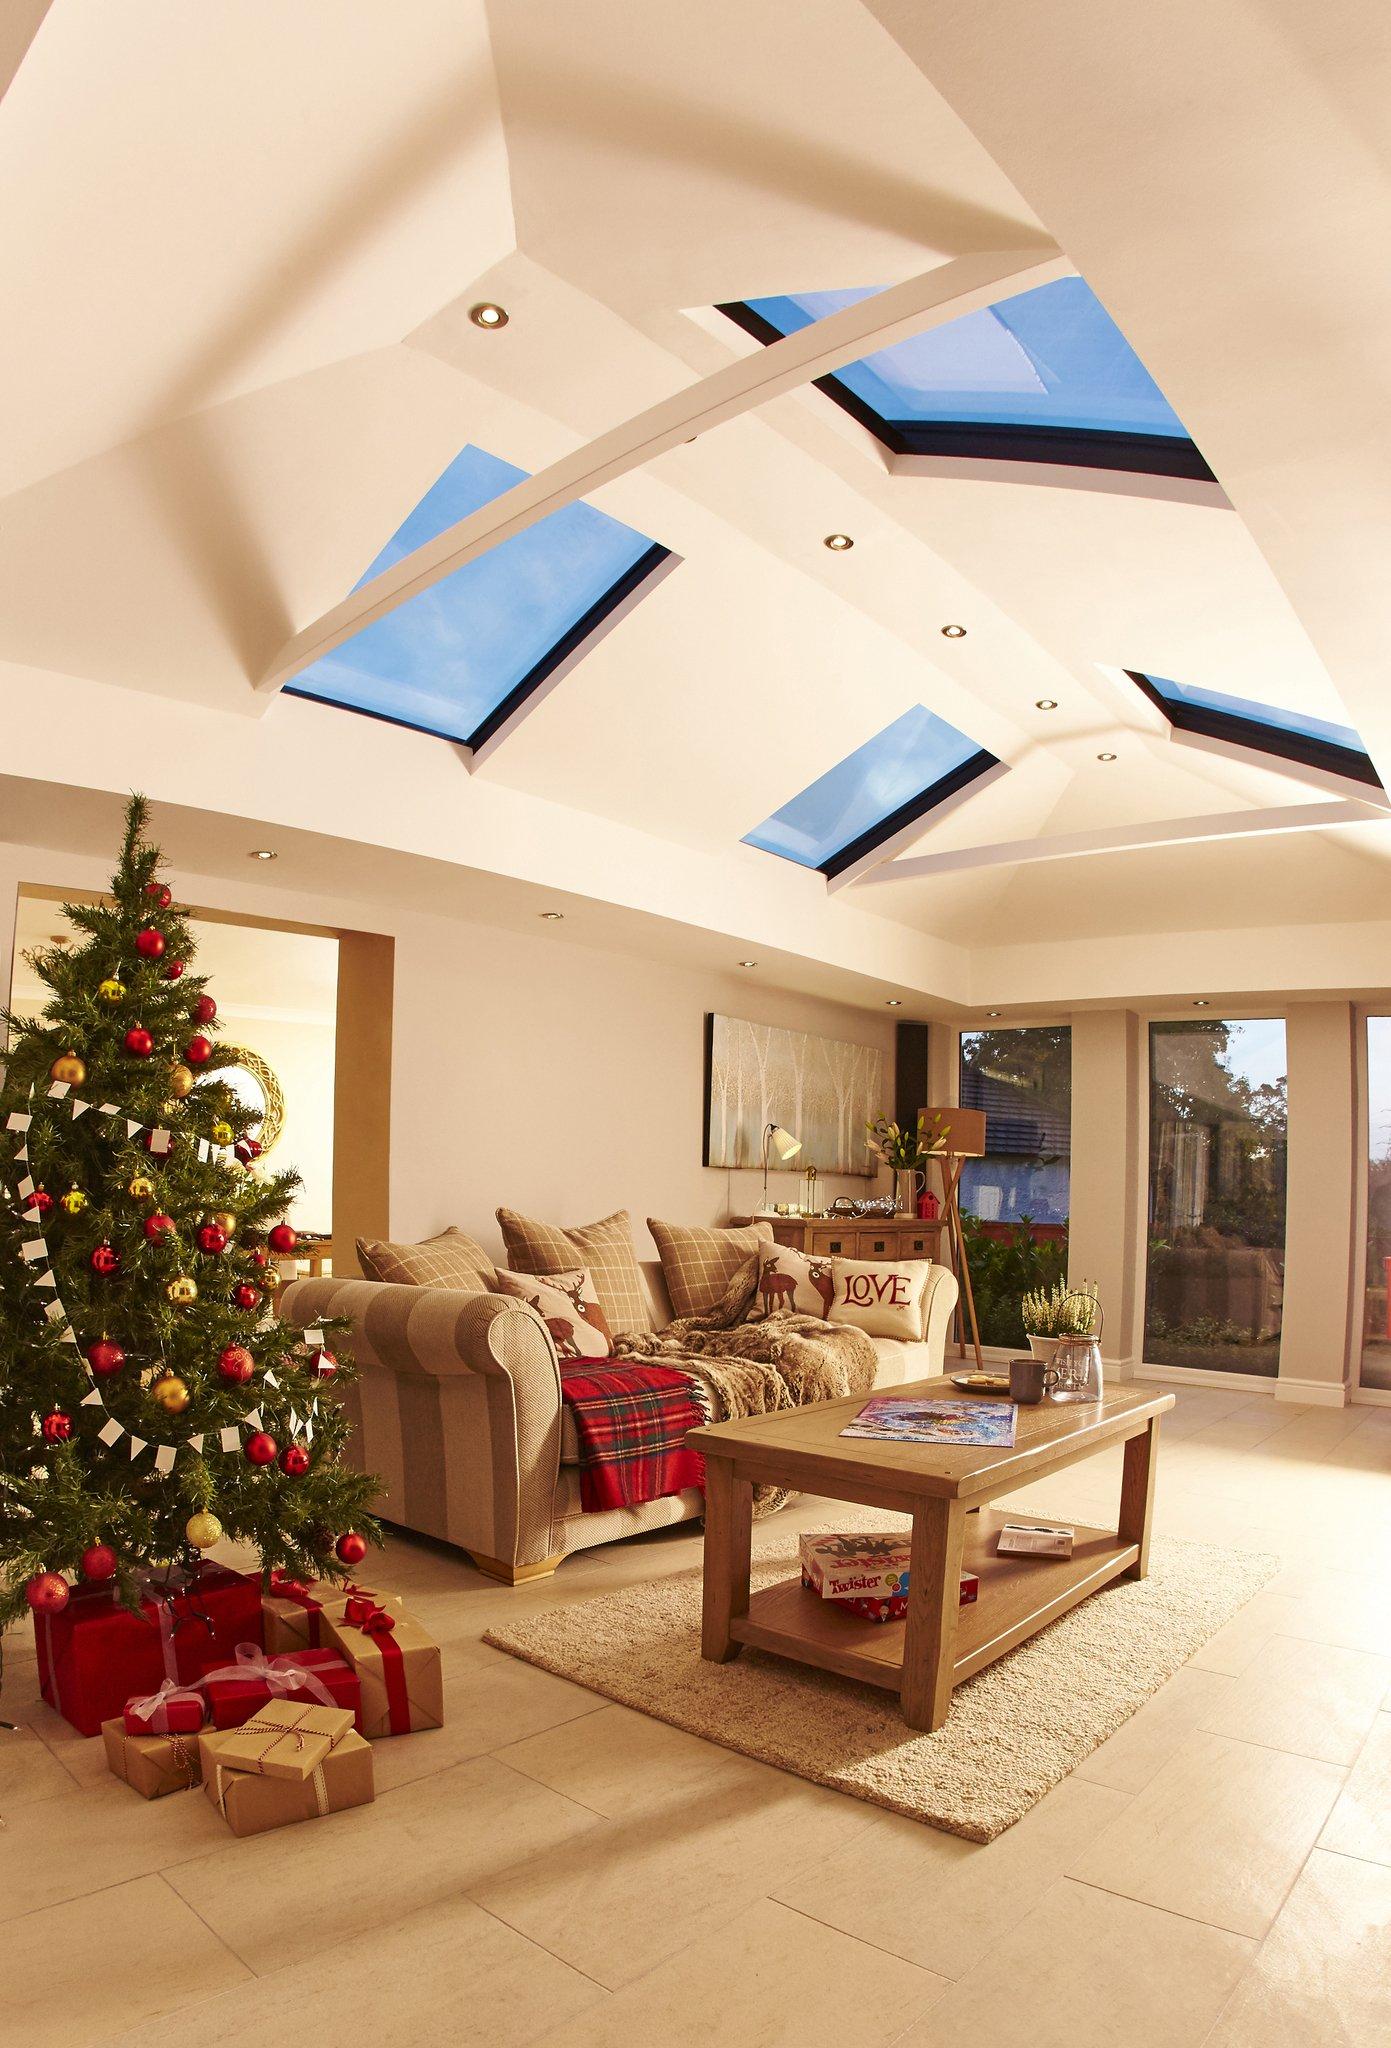 Interiors of conservatory